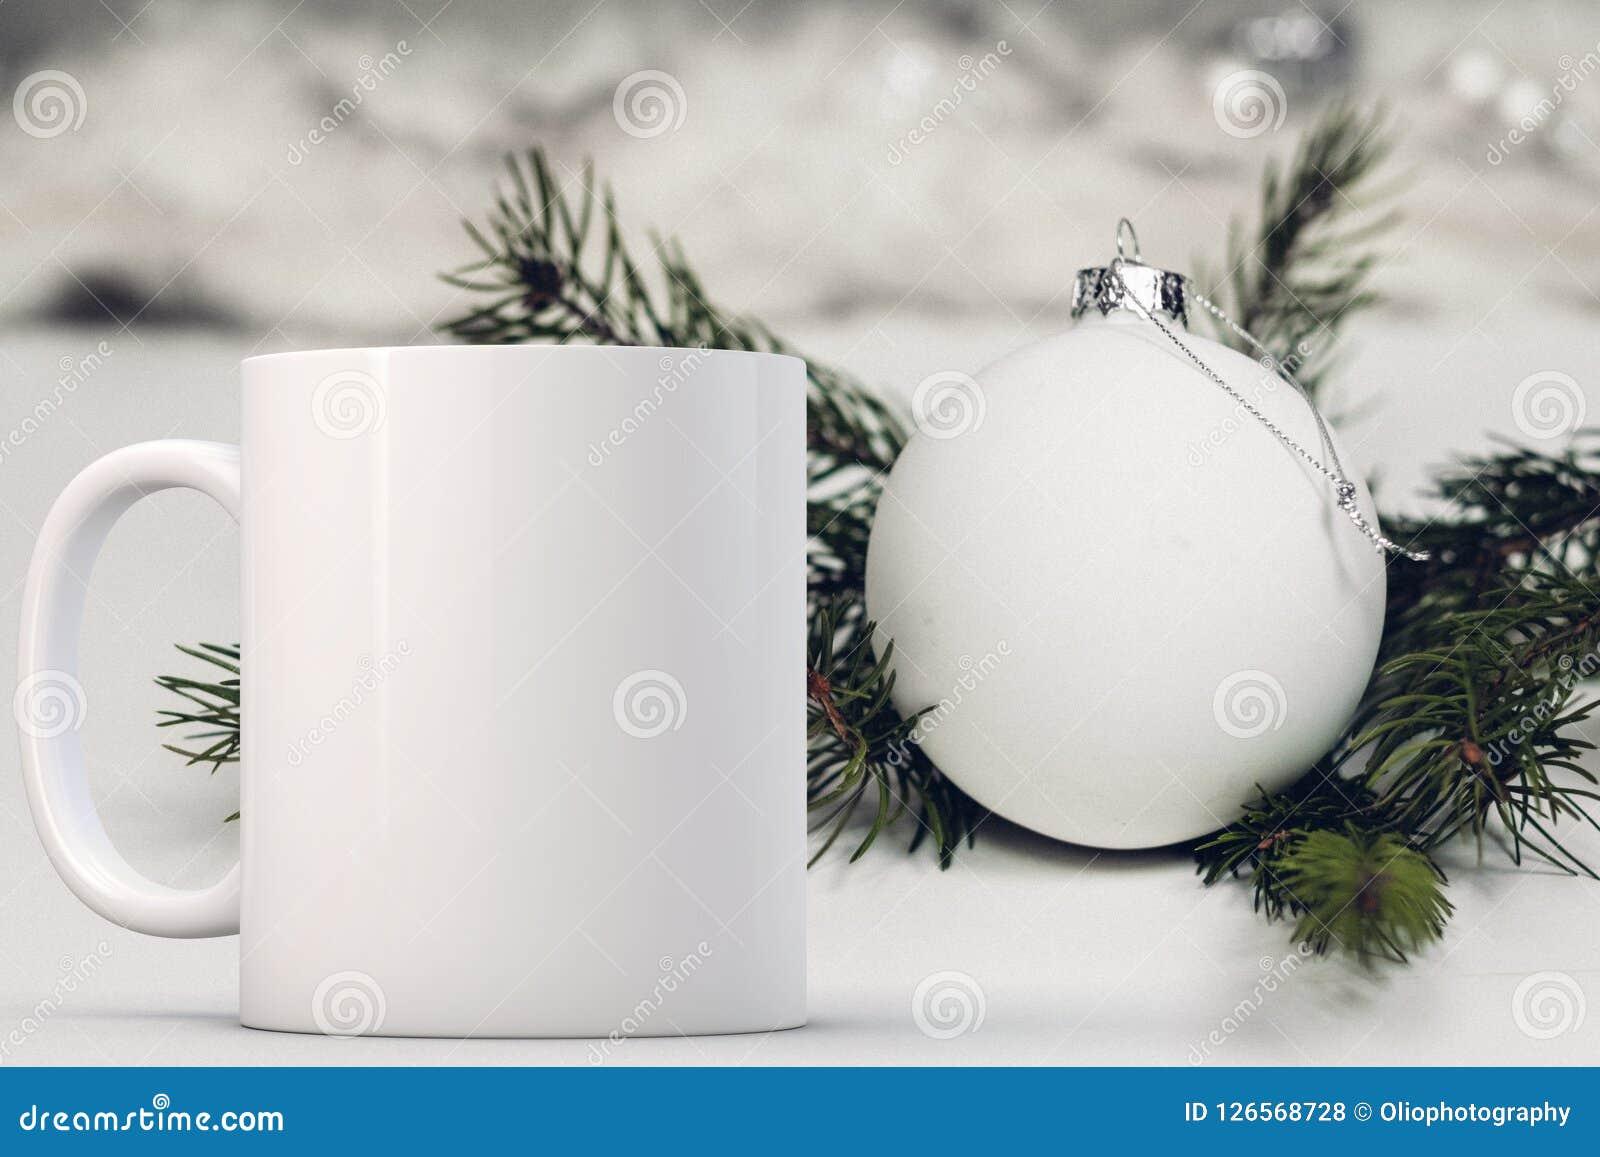 White Blank Coffee Mug Christmas Theme Mock Up Stock Photo Image Of Coffee Design 126568728